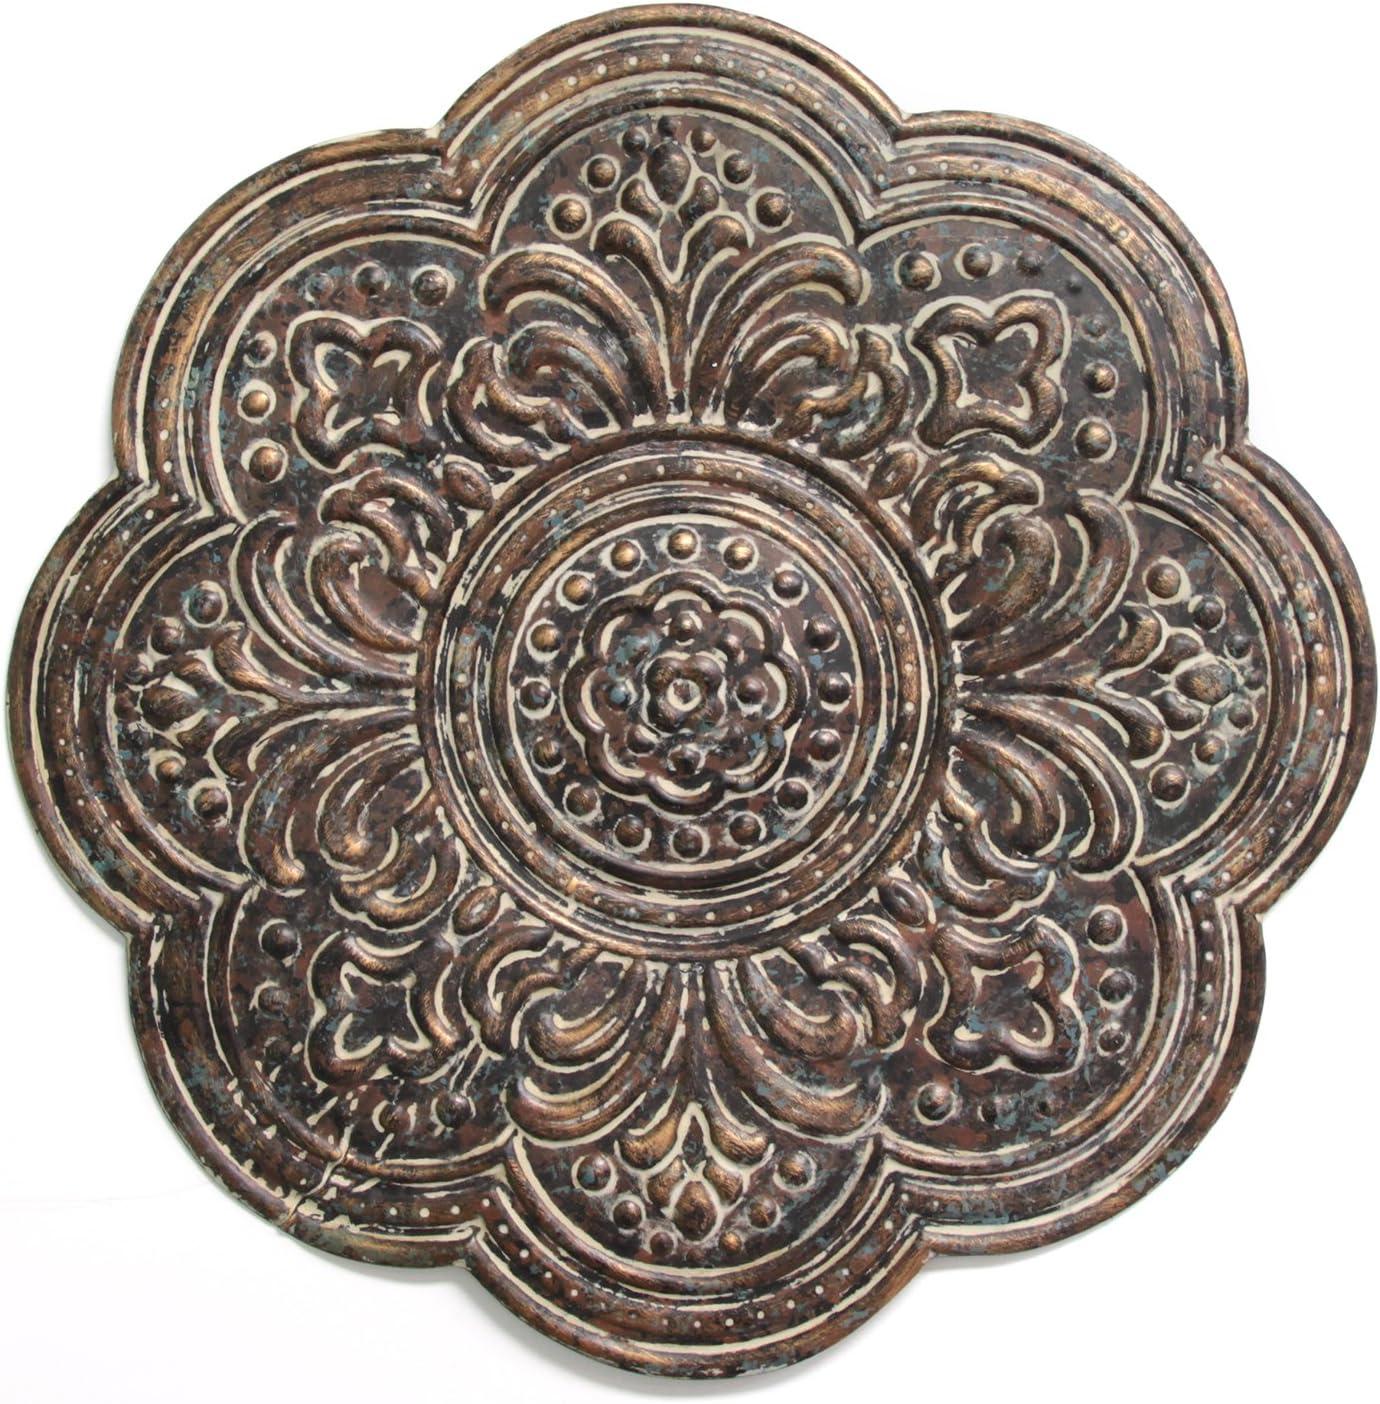 Stratton Home Décor S11571 Rustic Bronze Medallion Wall Décor, 18.00 W X 0.50 D X 18.00 H, Brown